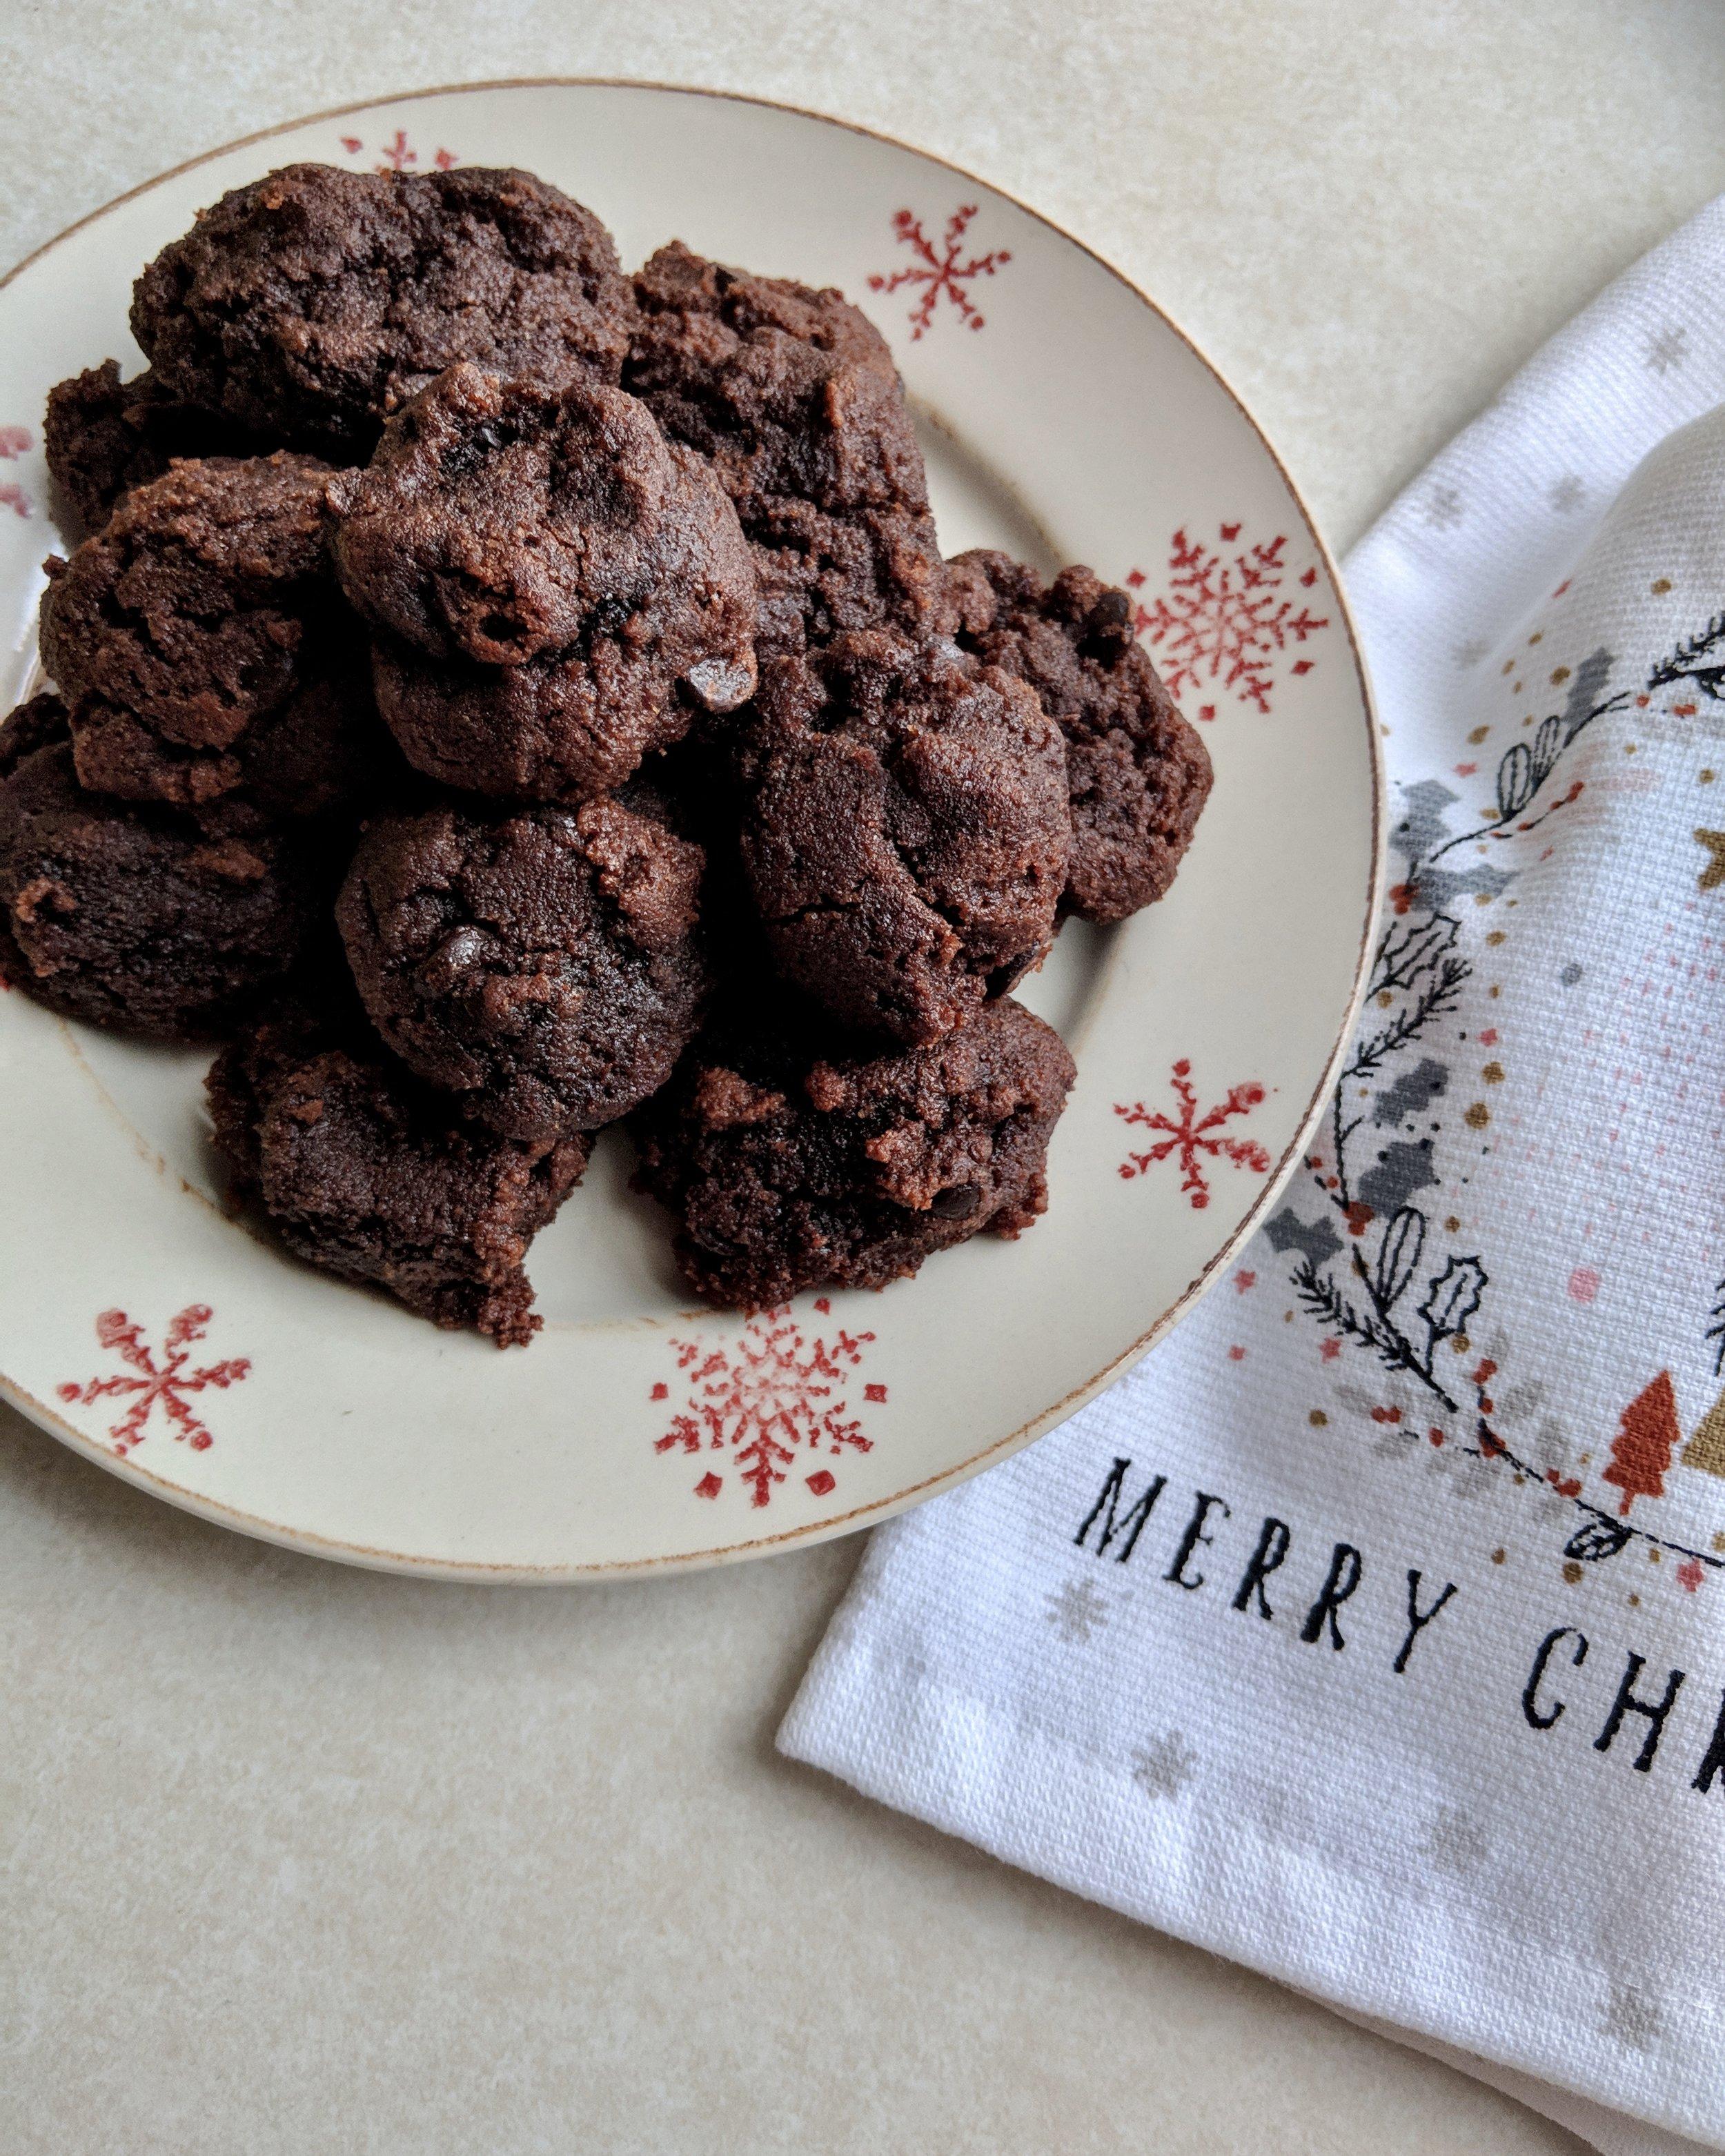 Fudgey chocolate cookies, lake superior kitchen, grain free, paleo cookies, gluten free